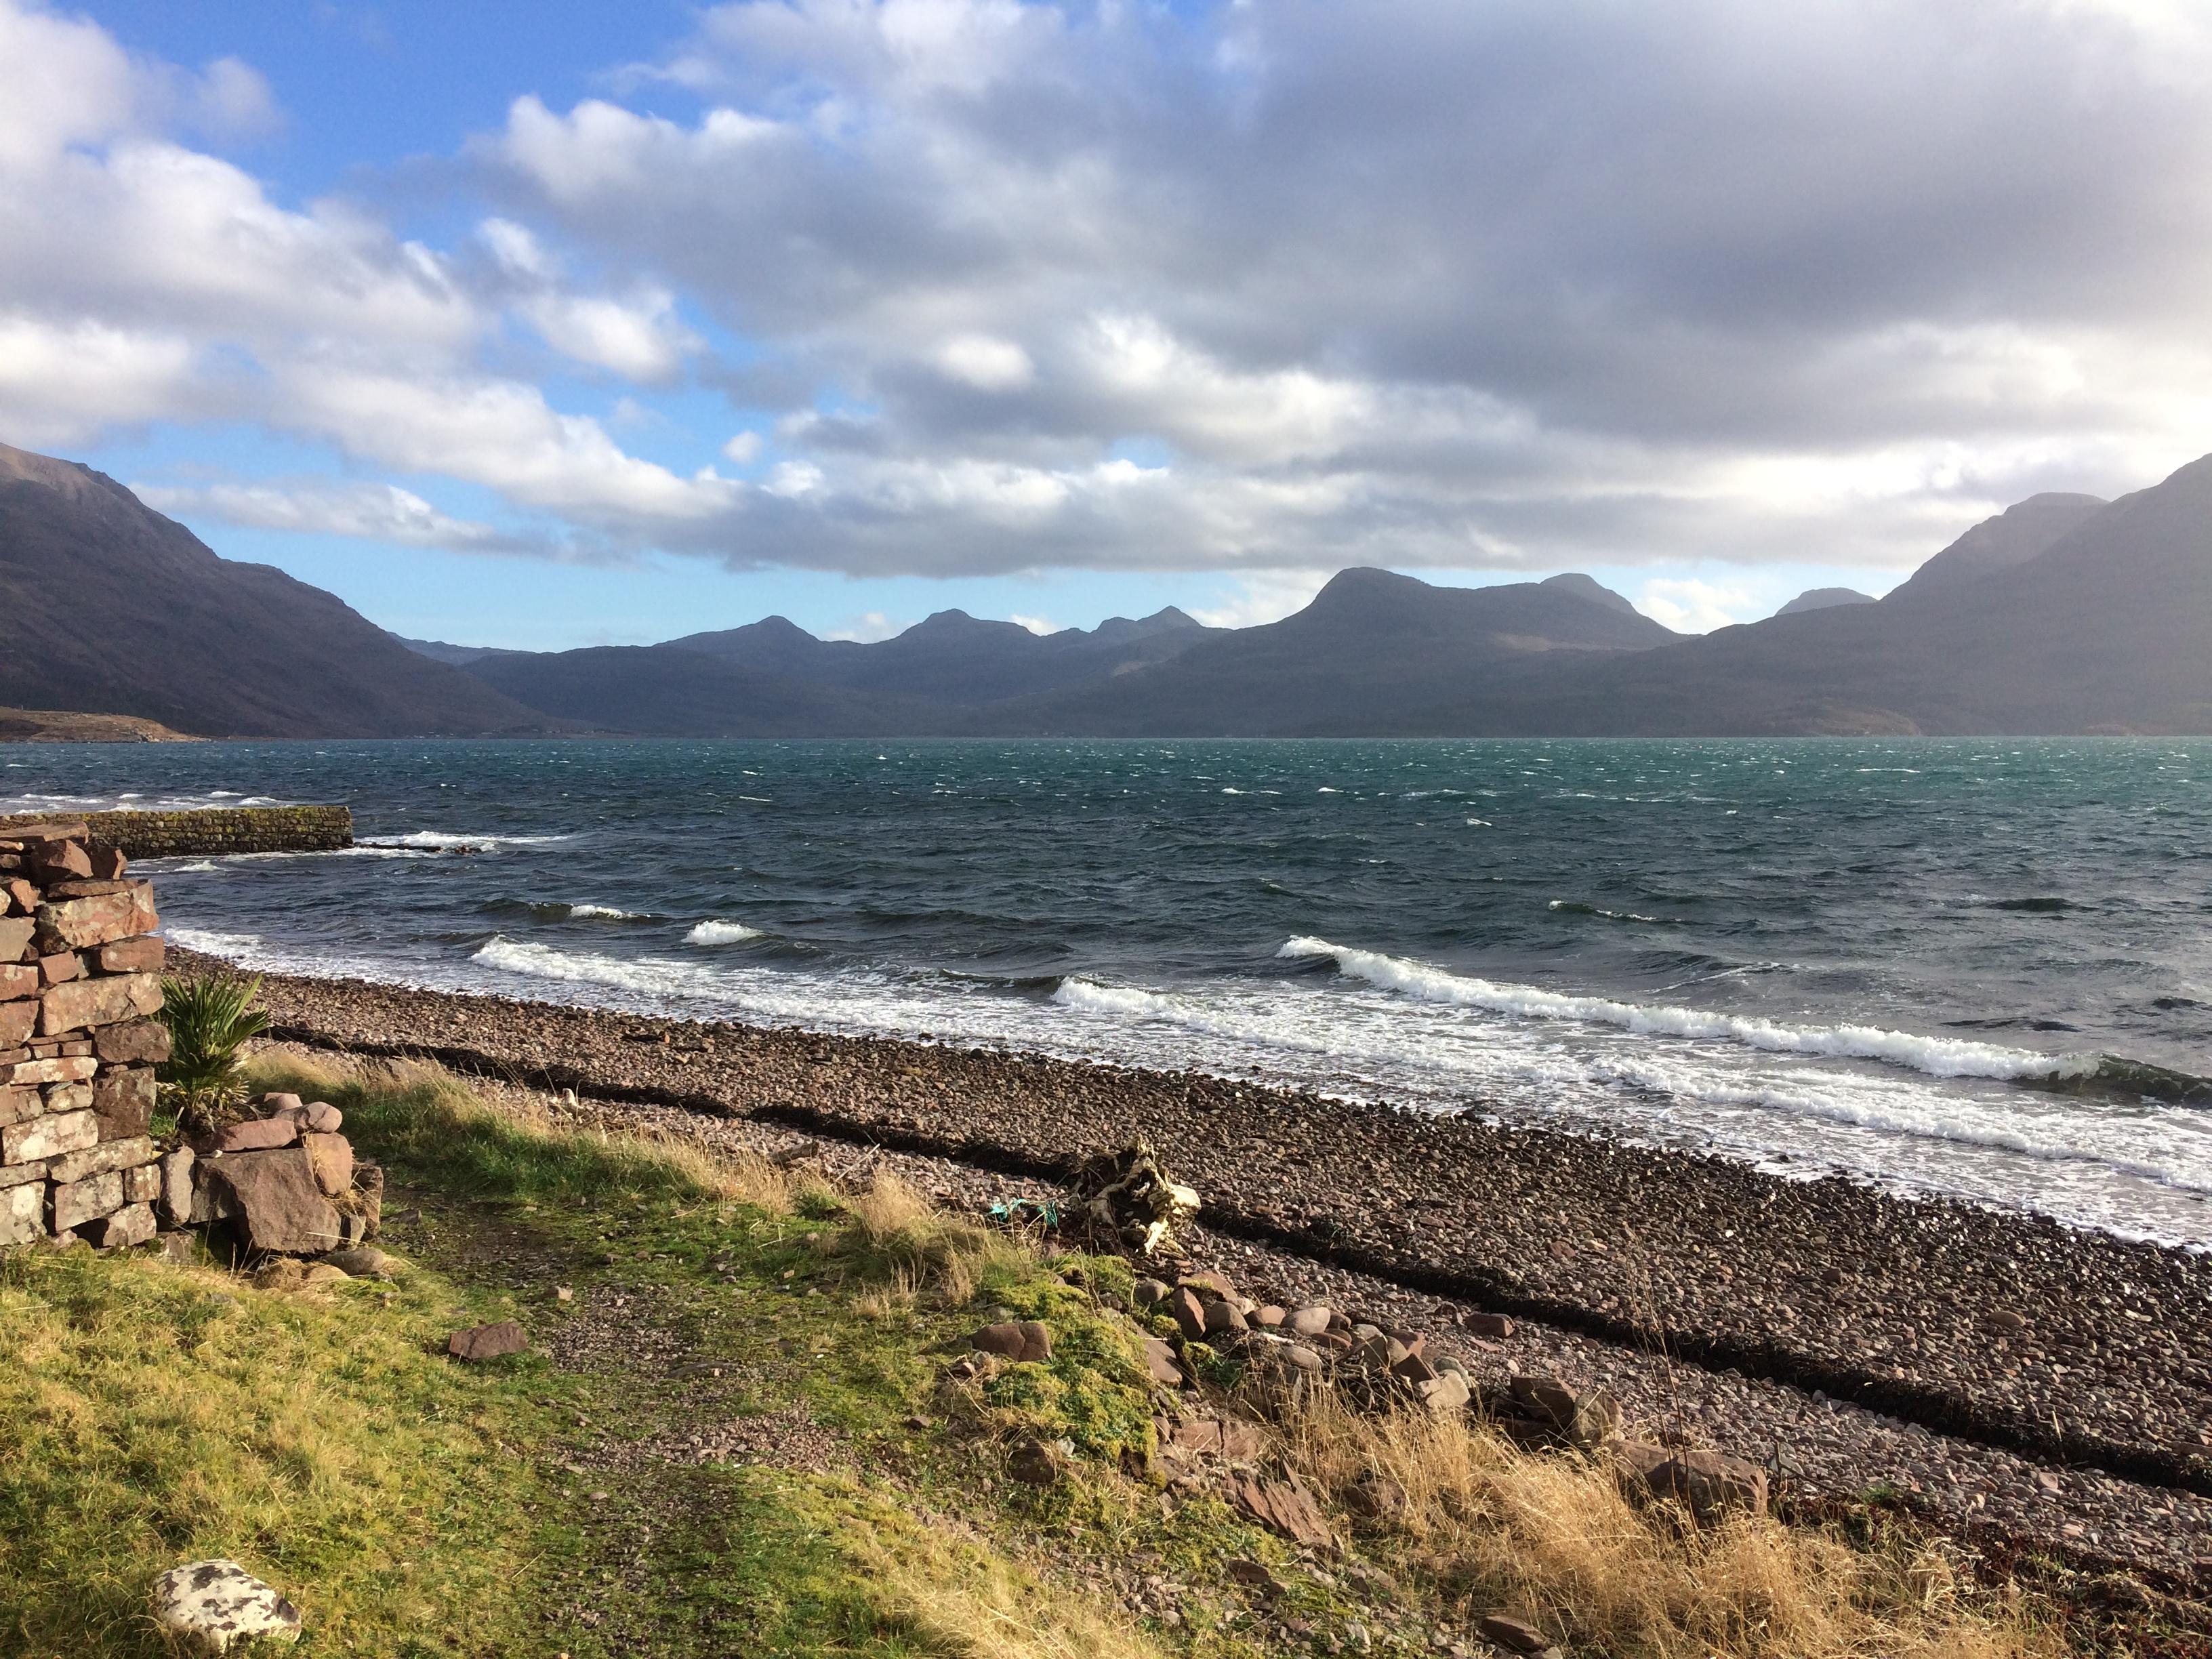 The view along Loch Torridon